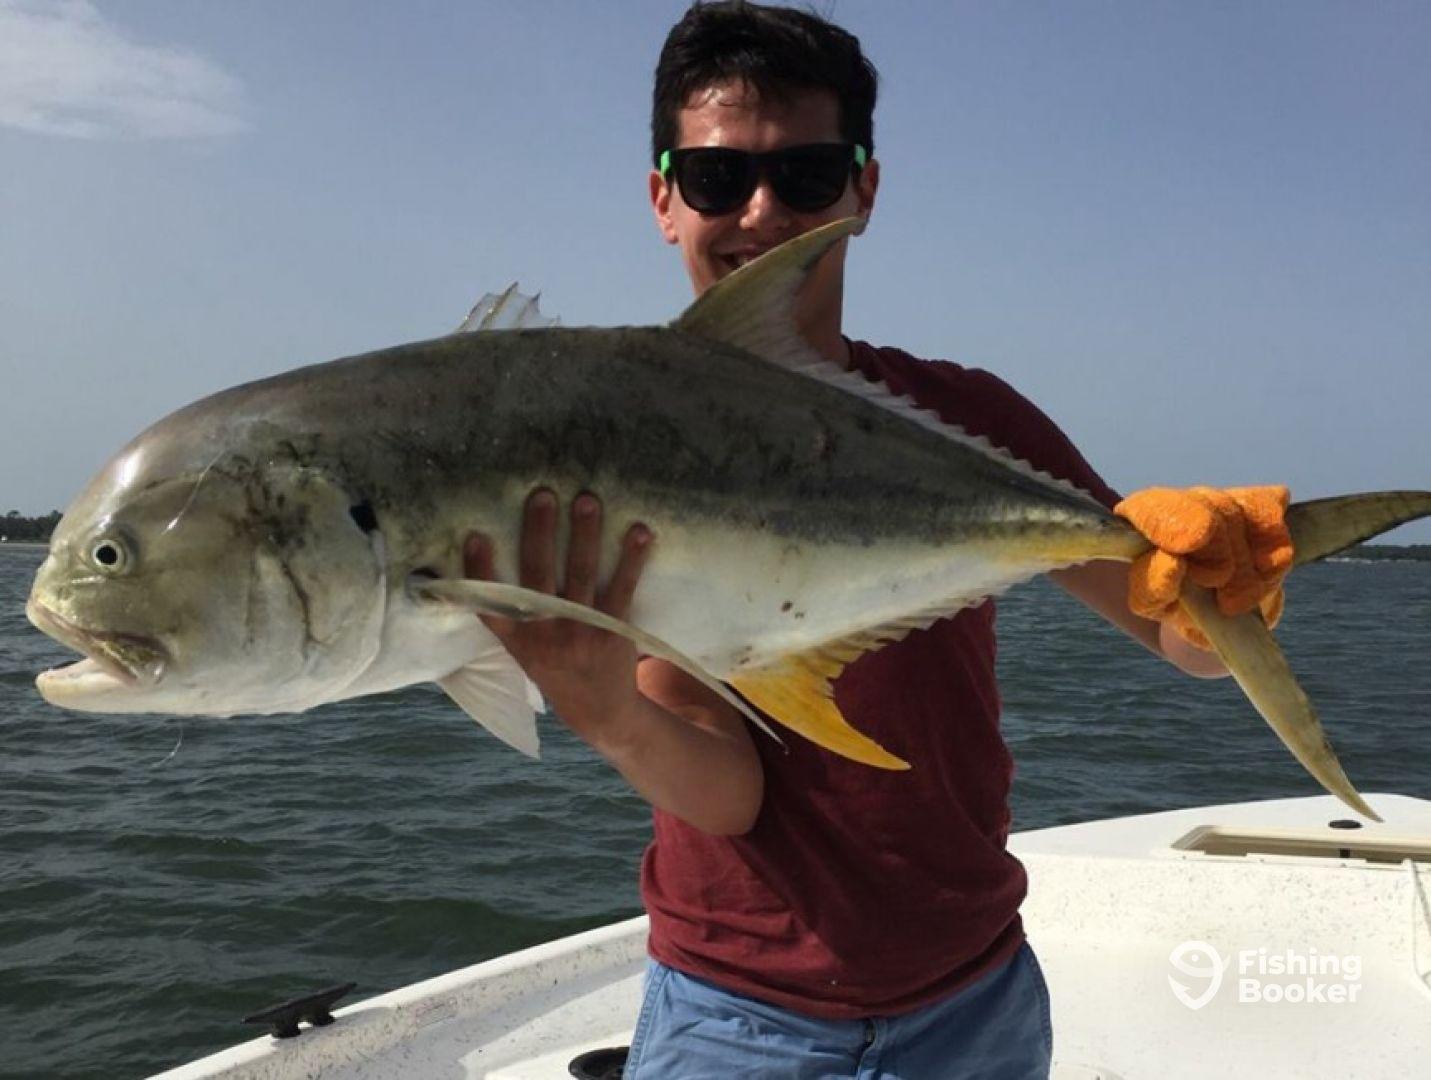 Angler management inshore fishing orange beach al for What is inshore fishing